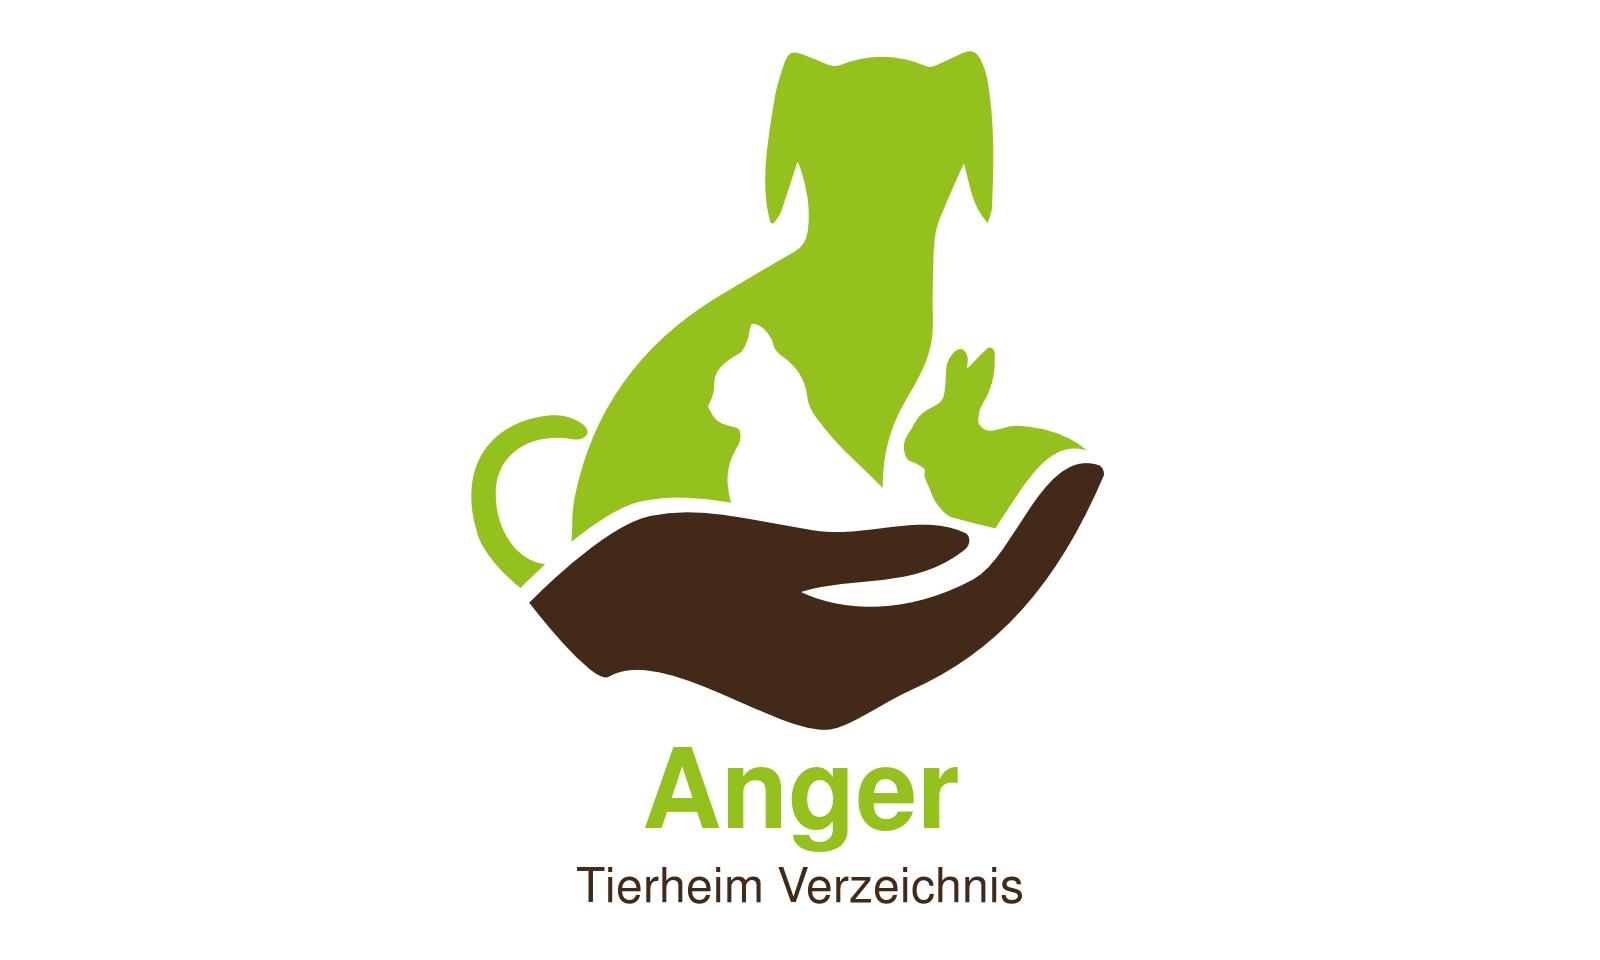 Tierheim Anger